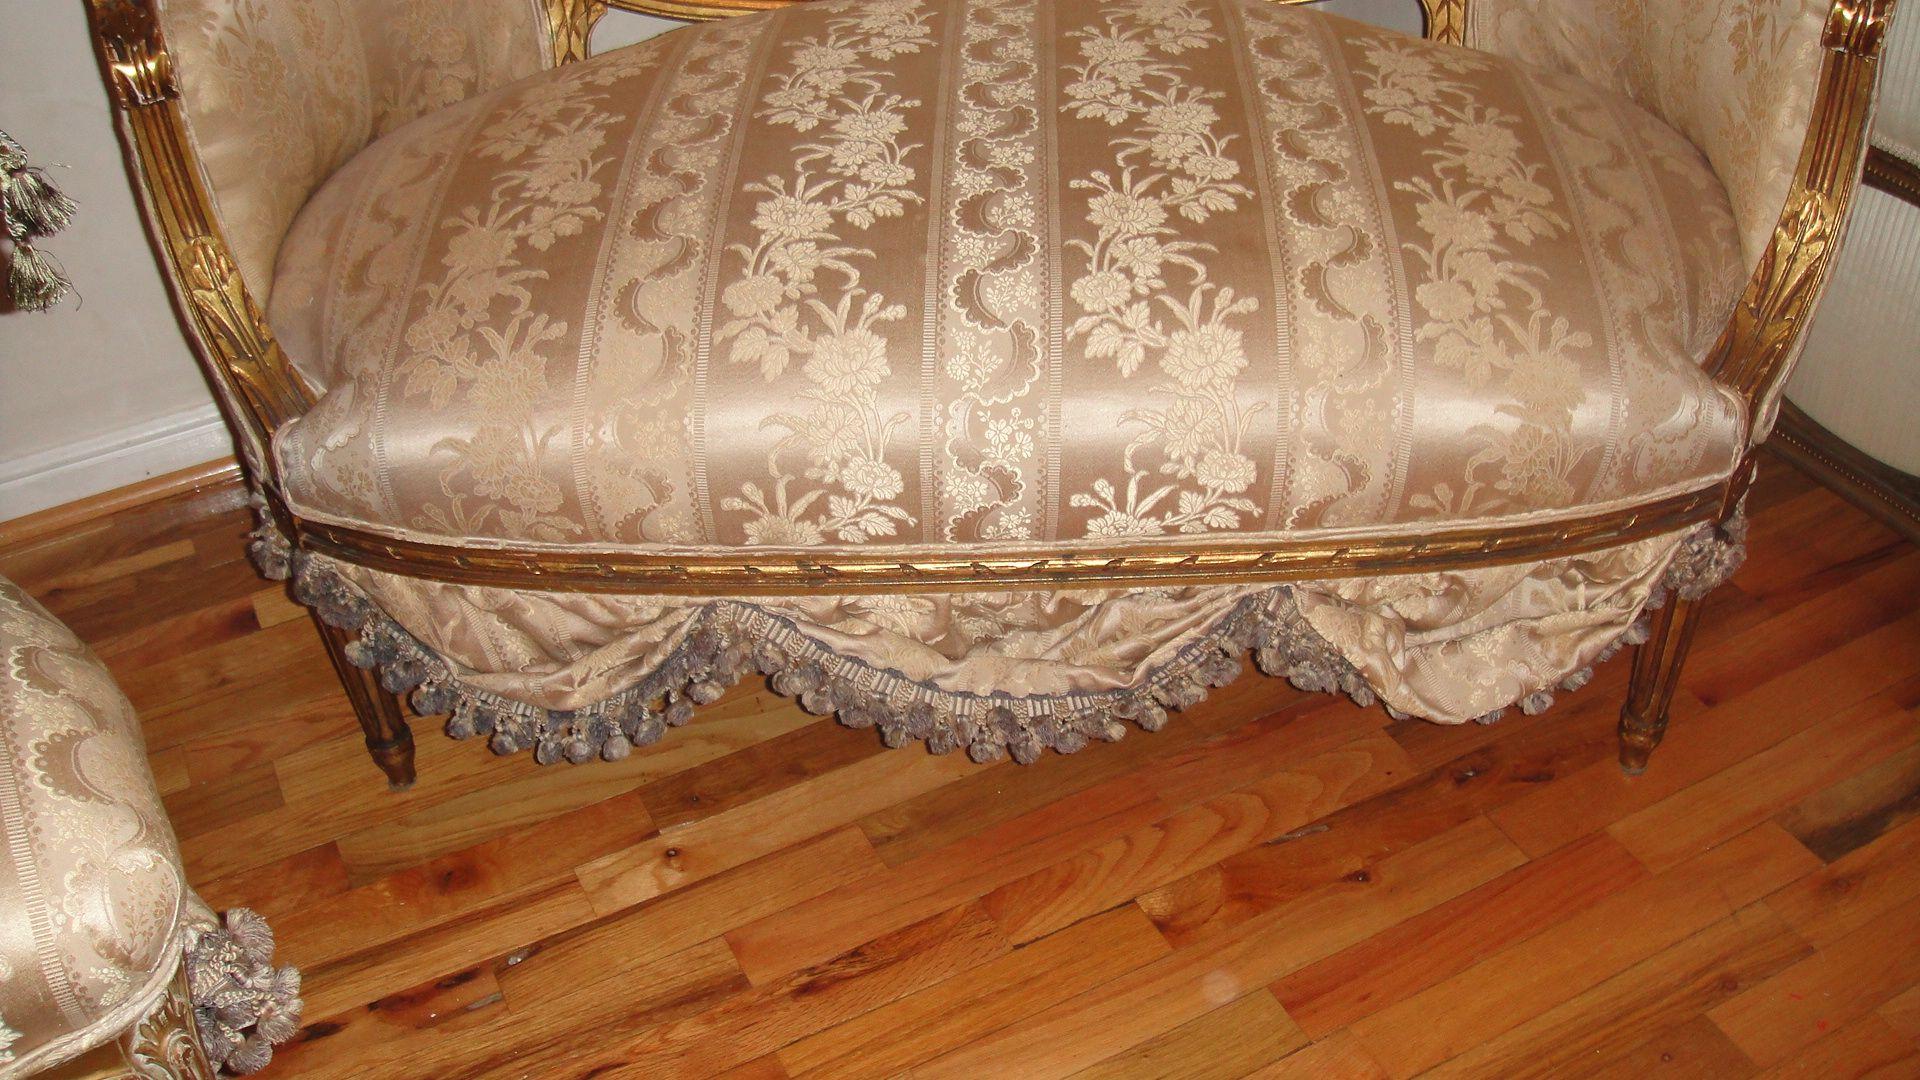 antique french sofa ebay small convertible settee loveseat circa 1800 39s scallops